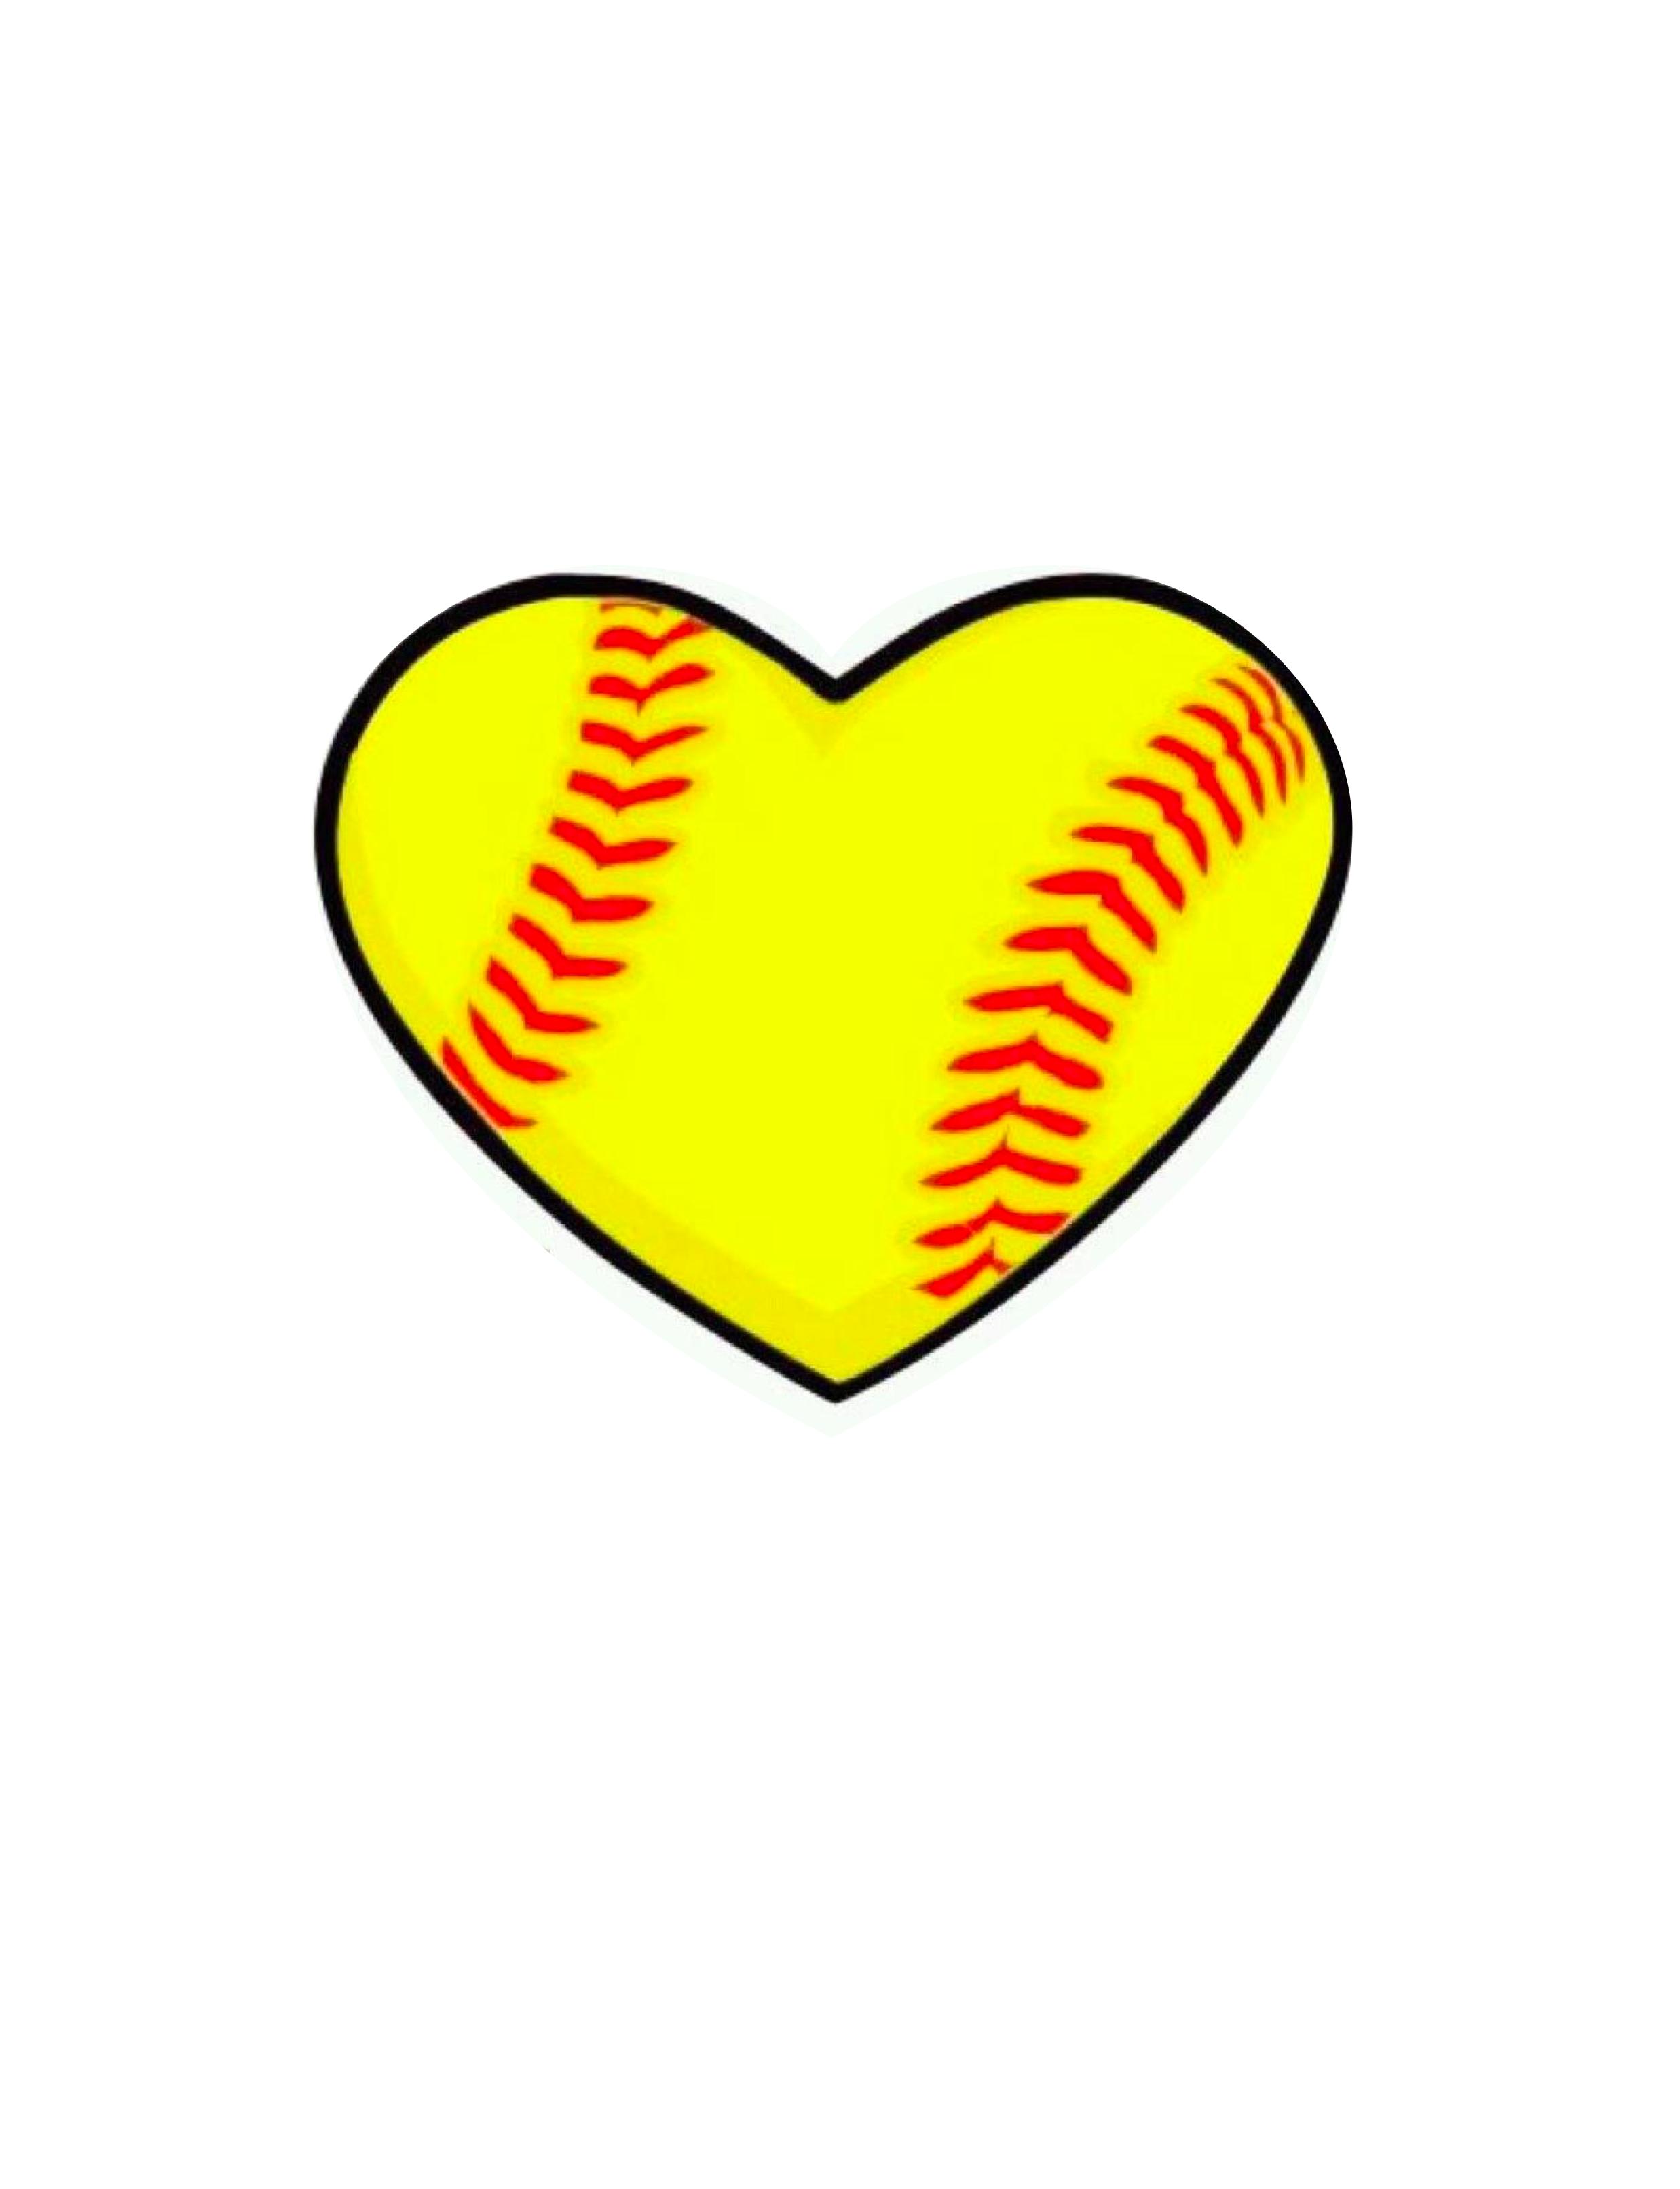 Hearts clipart softball  Mselite97 Fastpitch Softball Free+Printable+Softball+Clip+Art